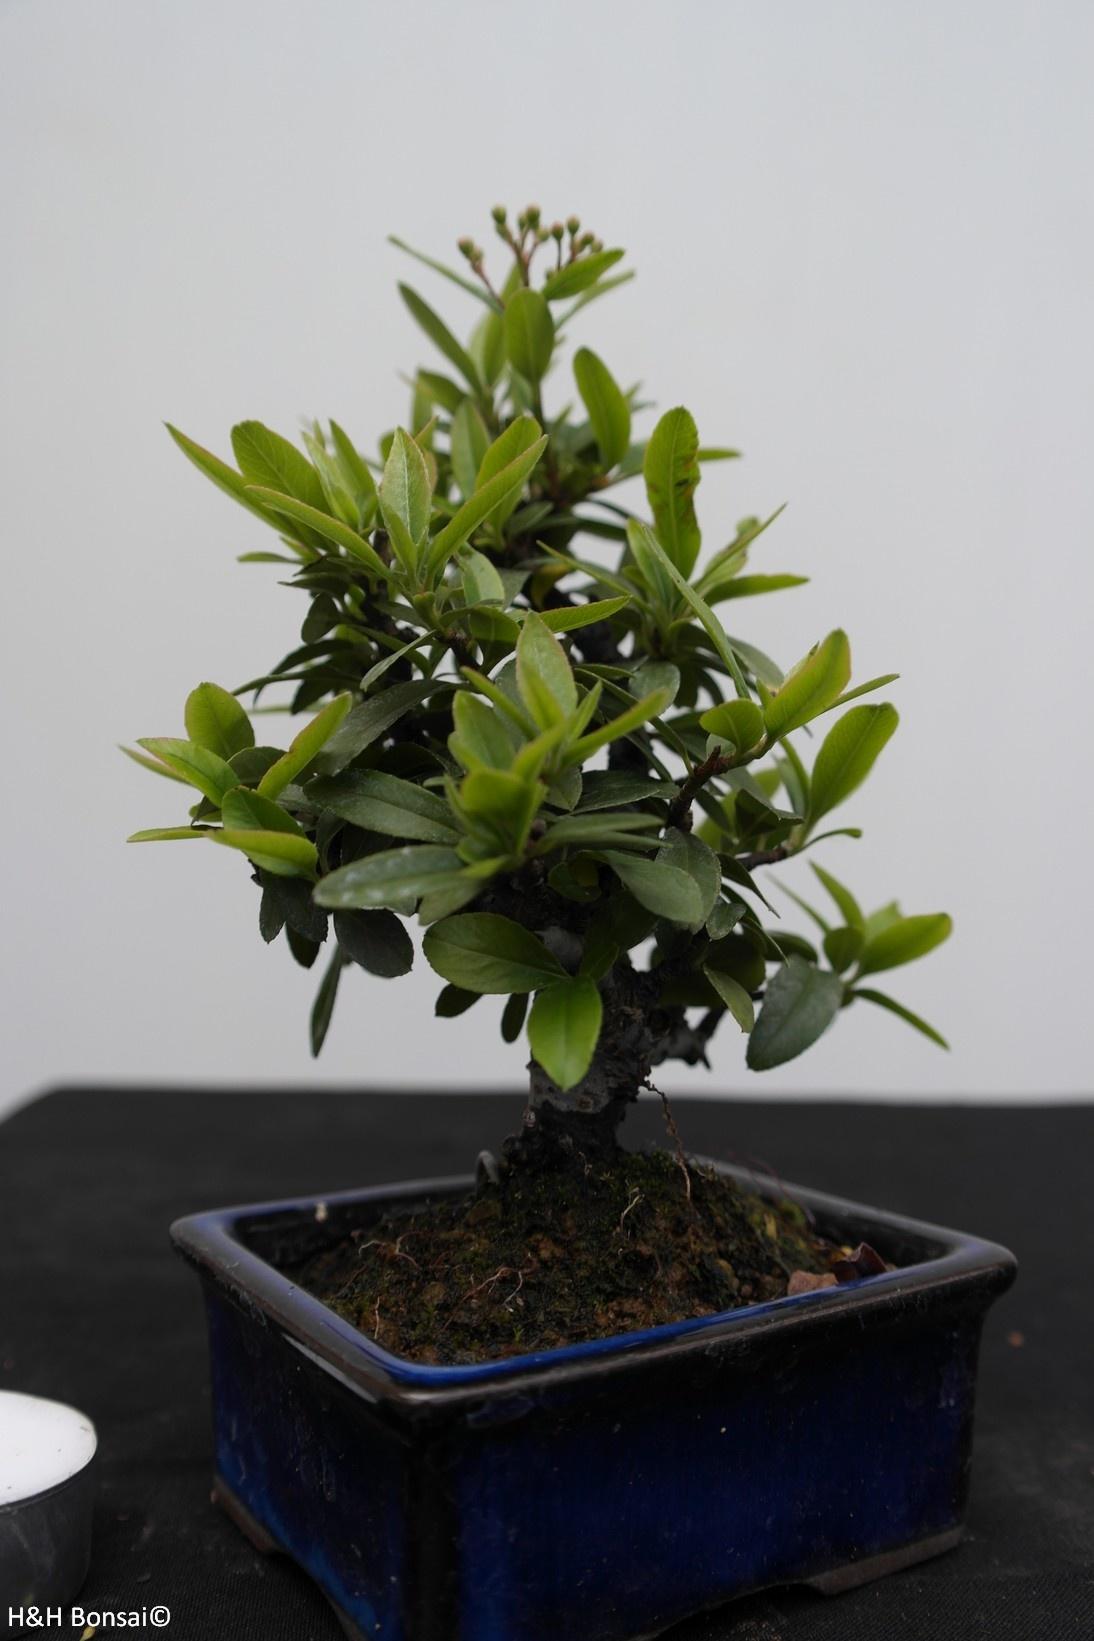 Bonsai Shohin Buisson ardent,Pyracantha, no. 7784